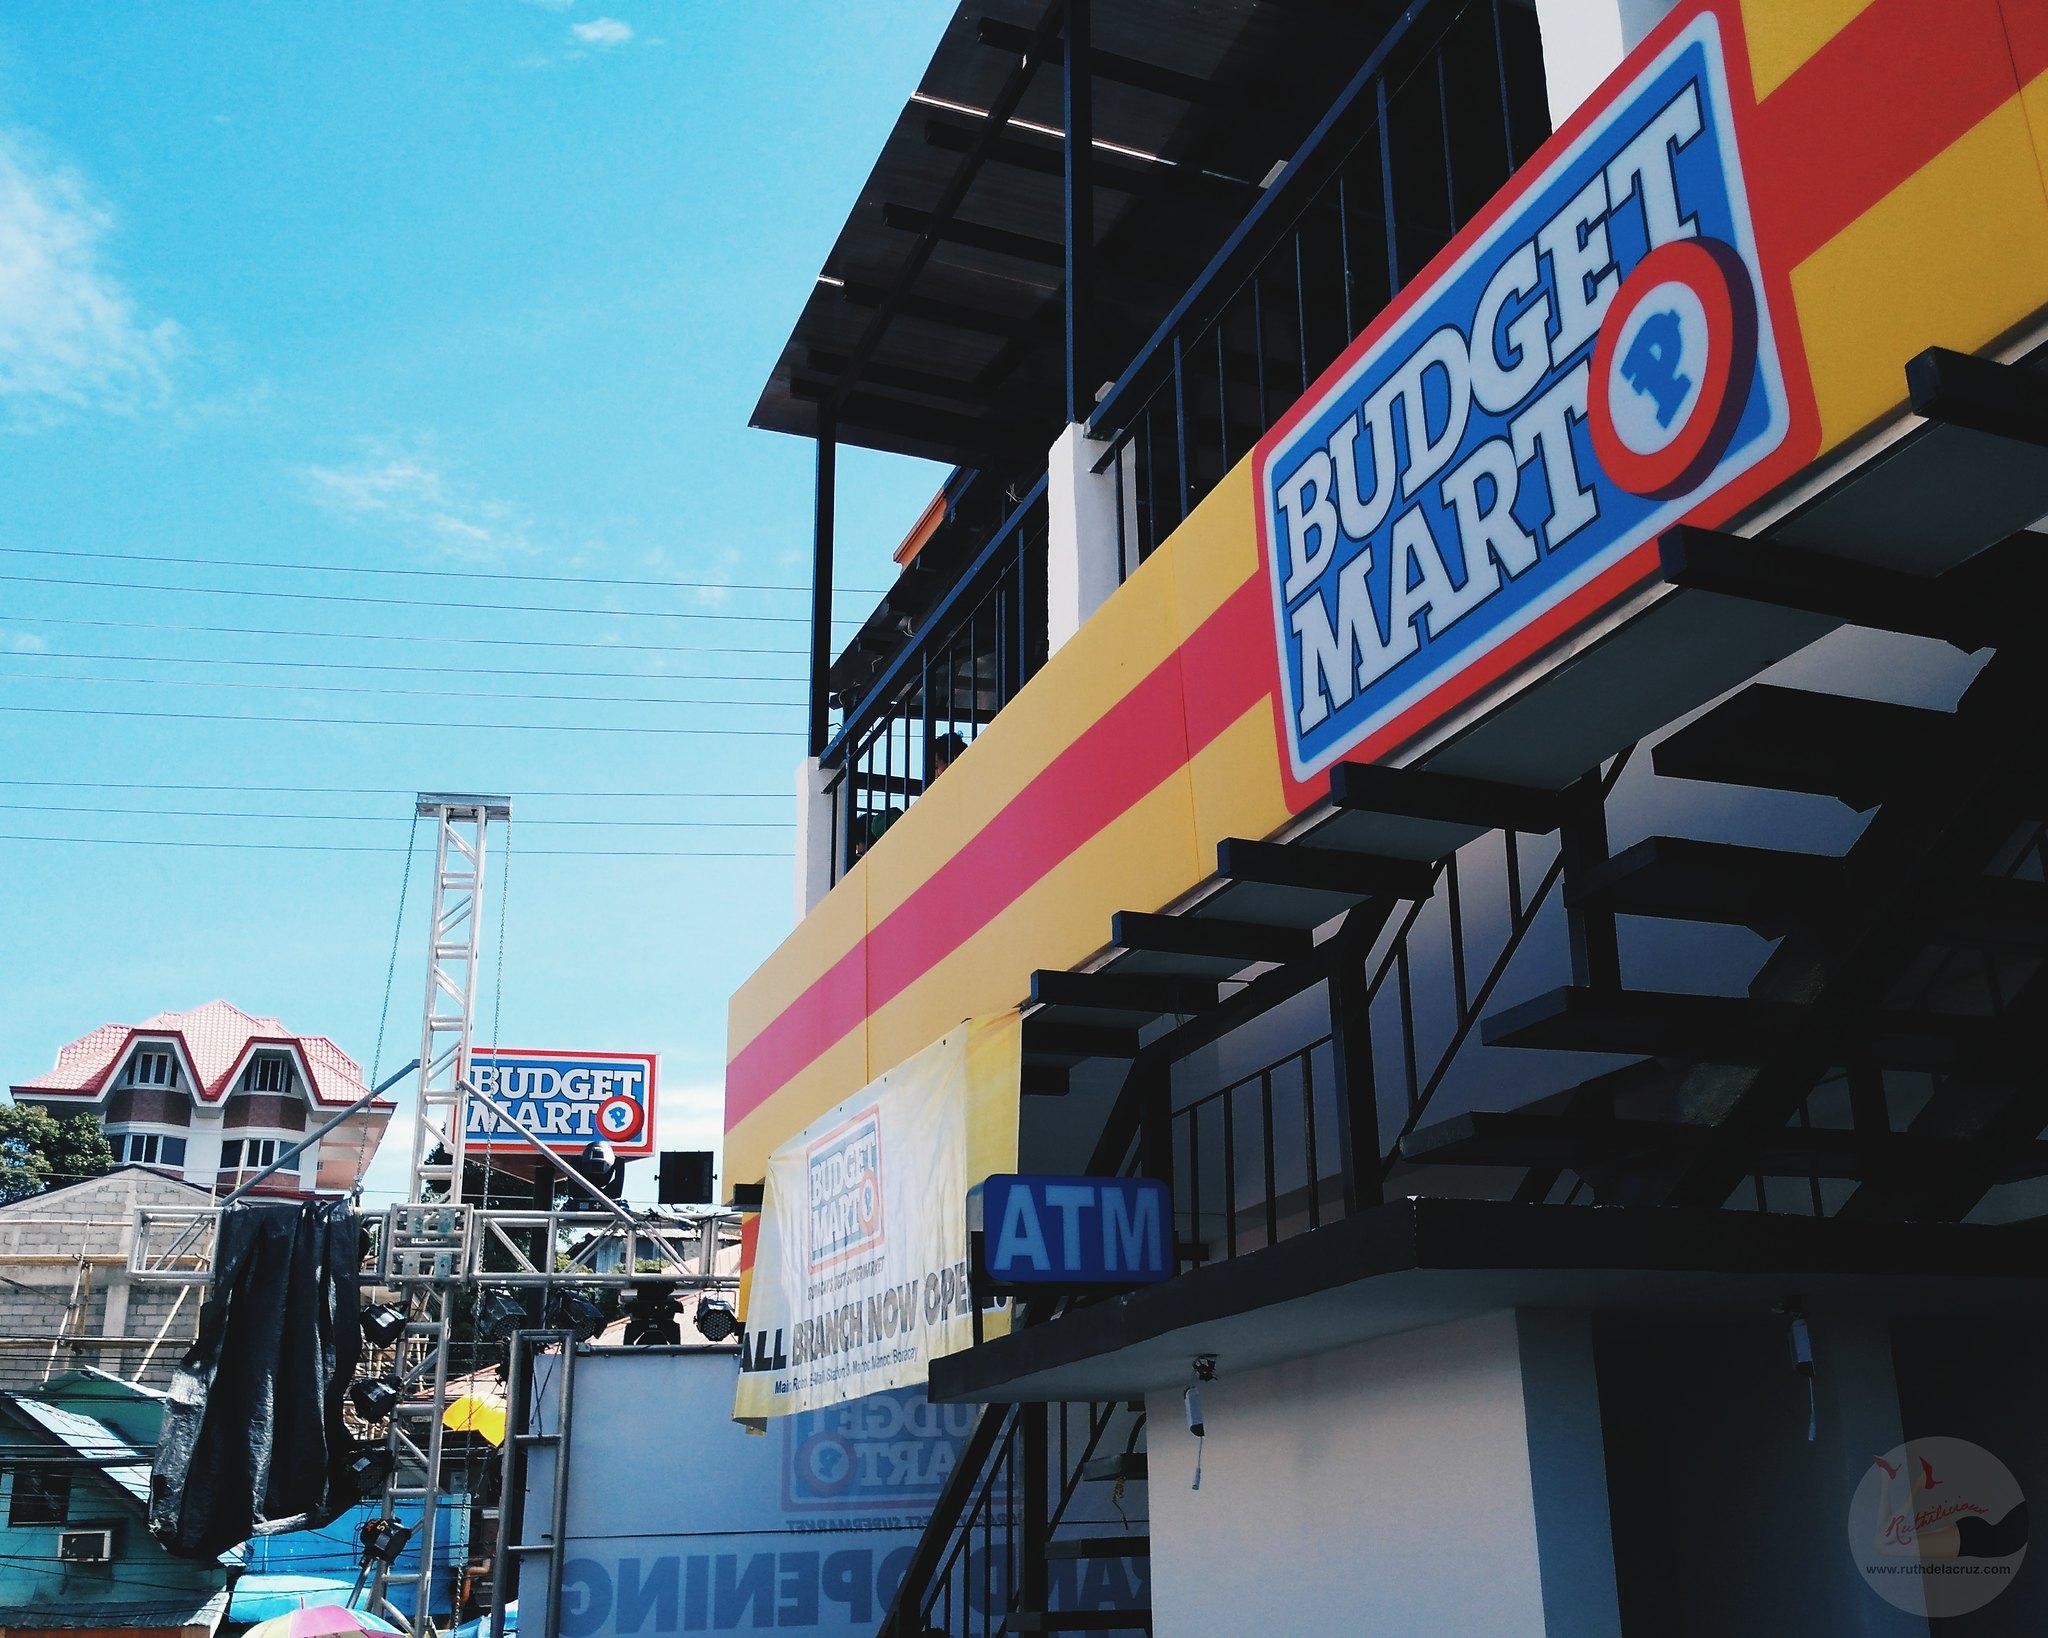 budget mart boracay station 3